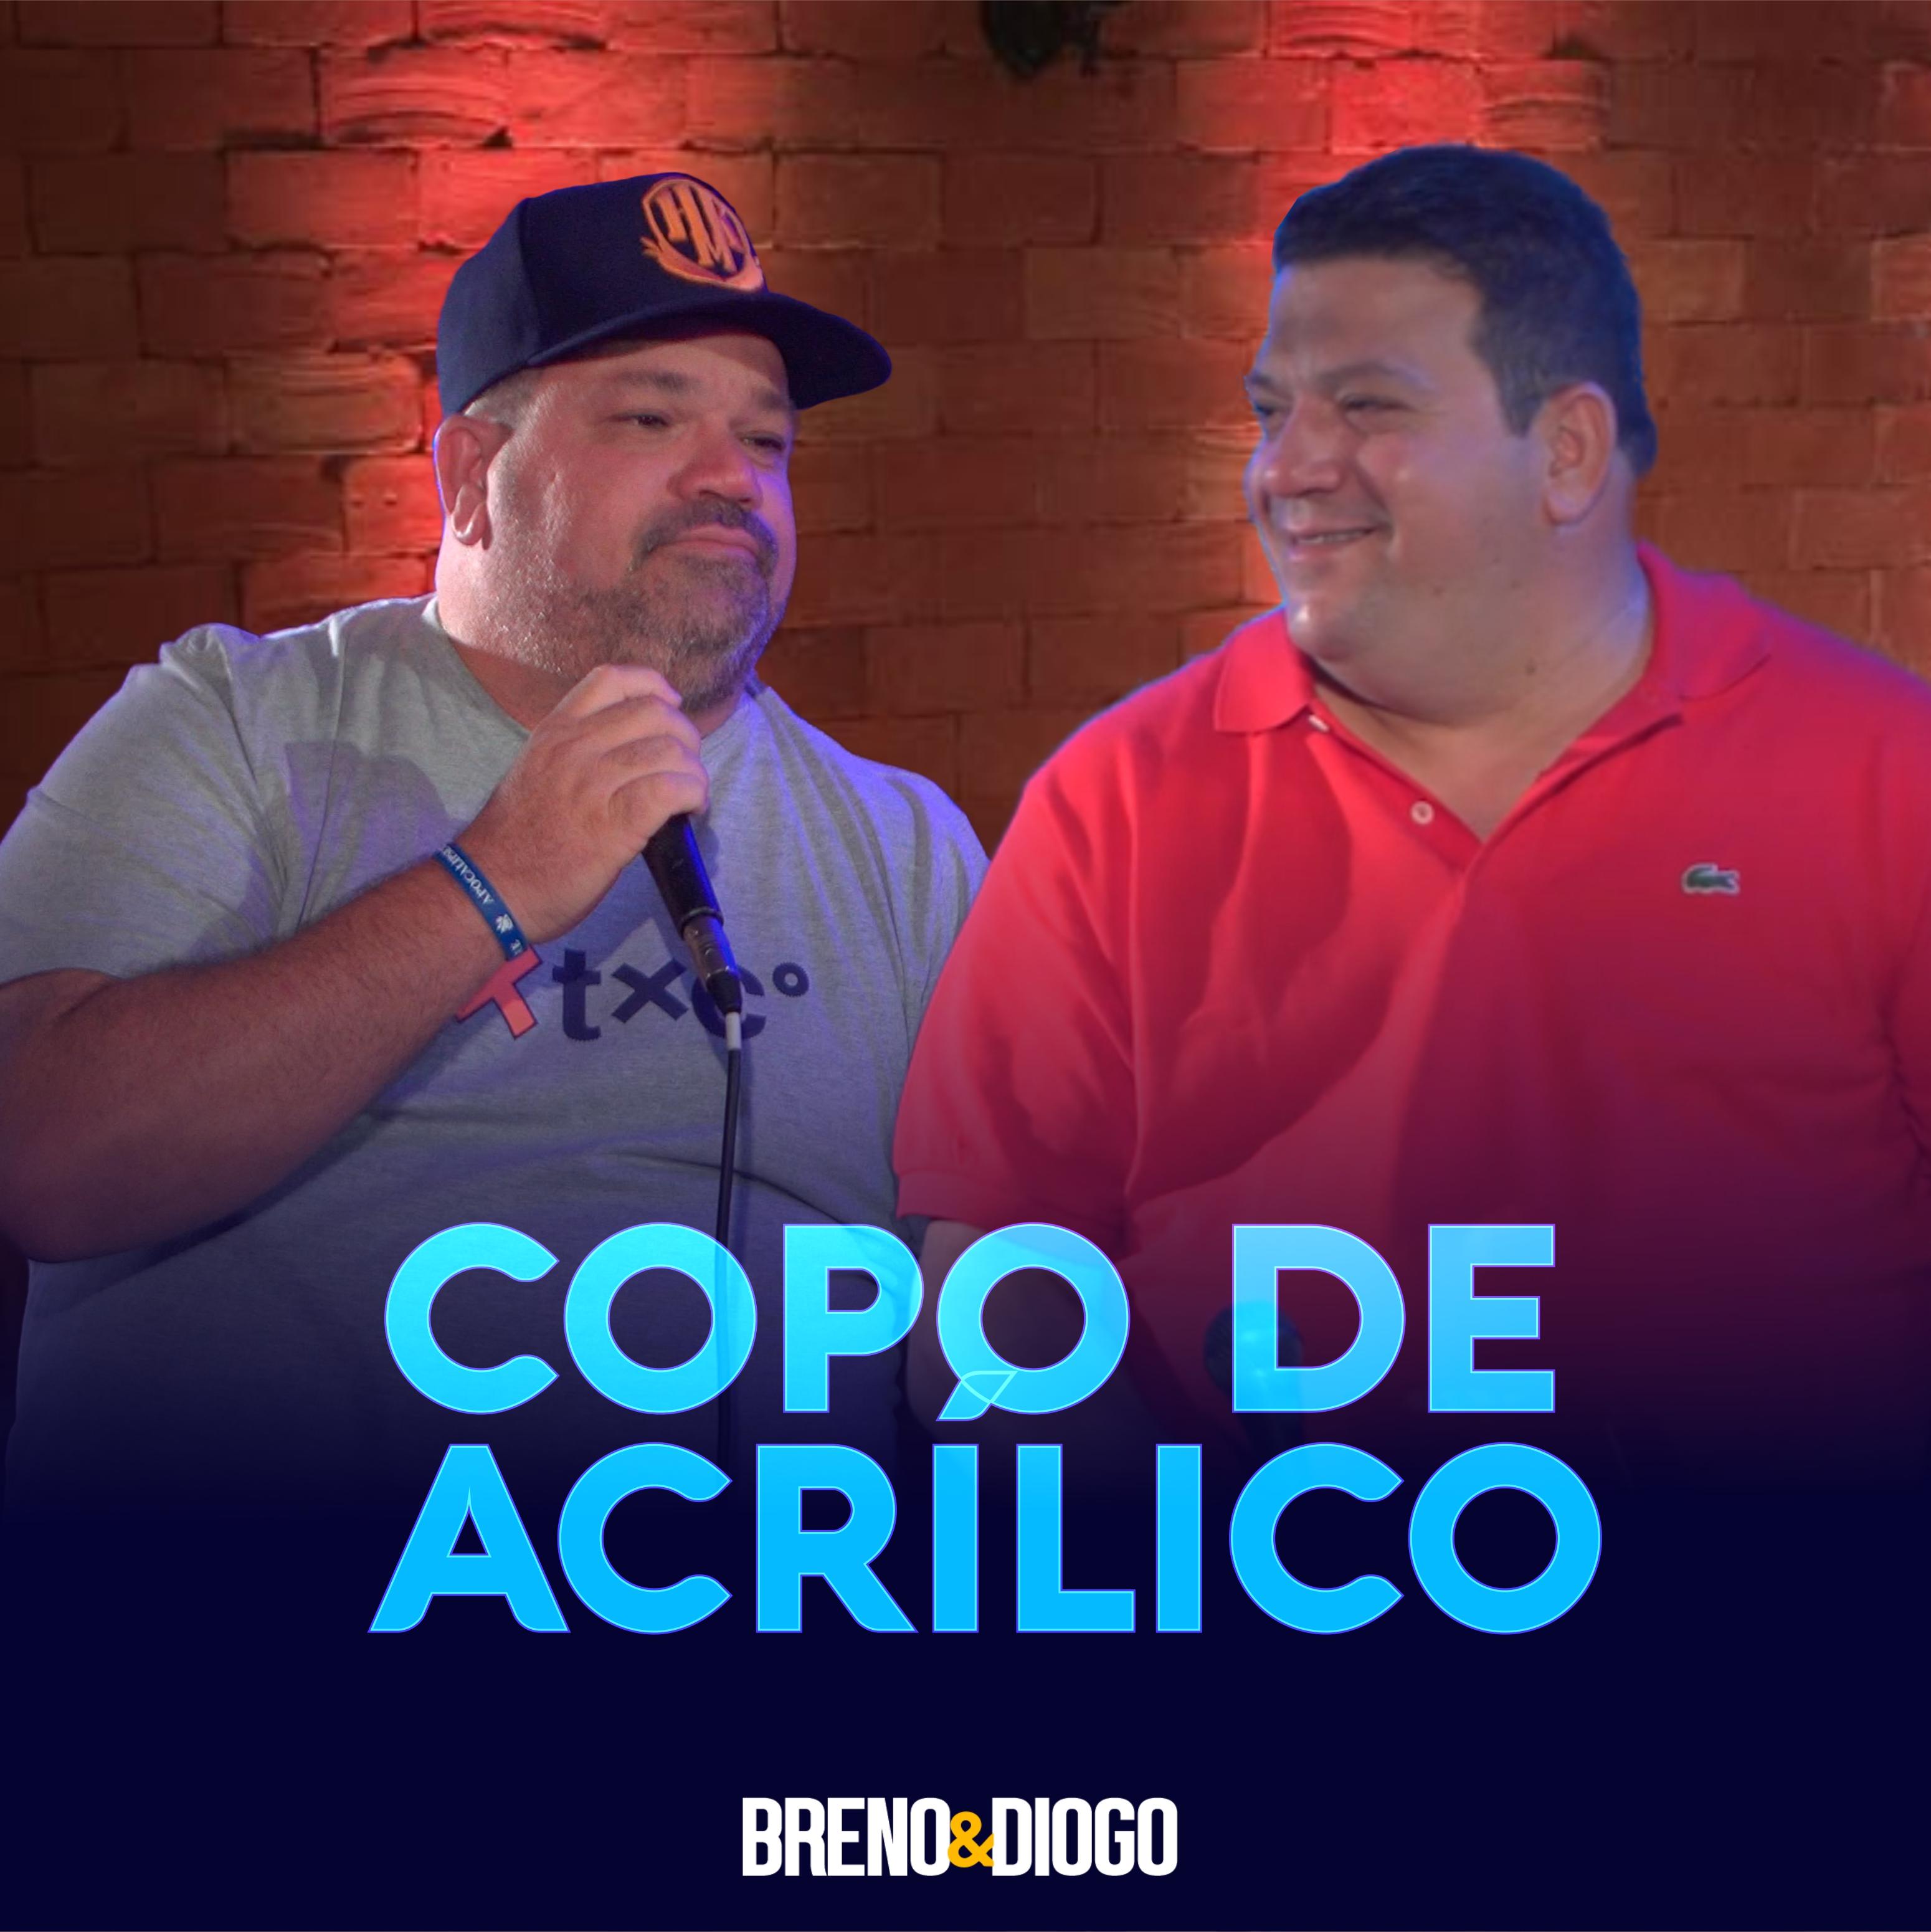 Breno & Diogo